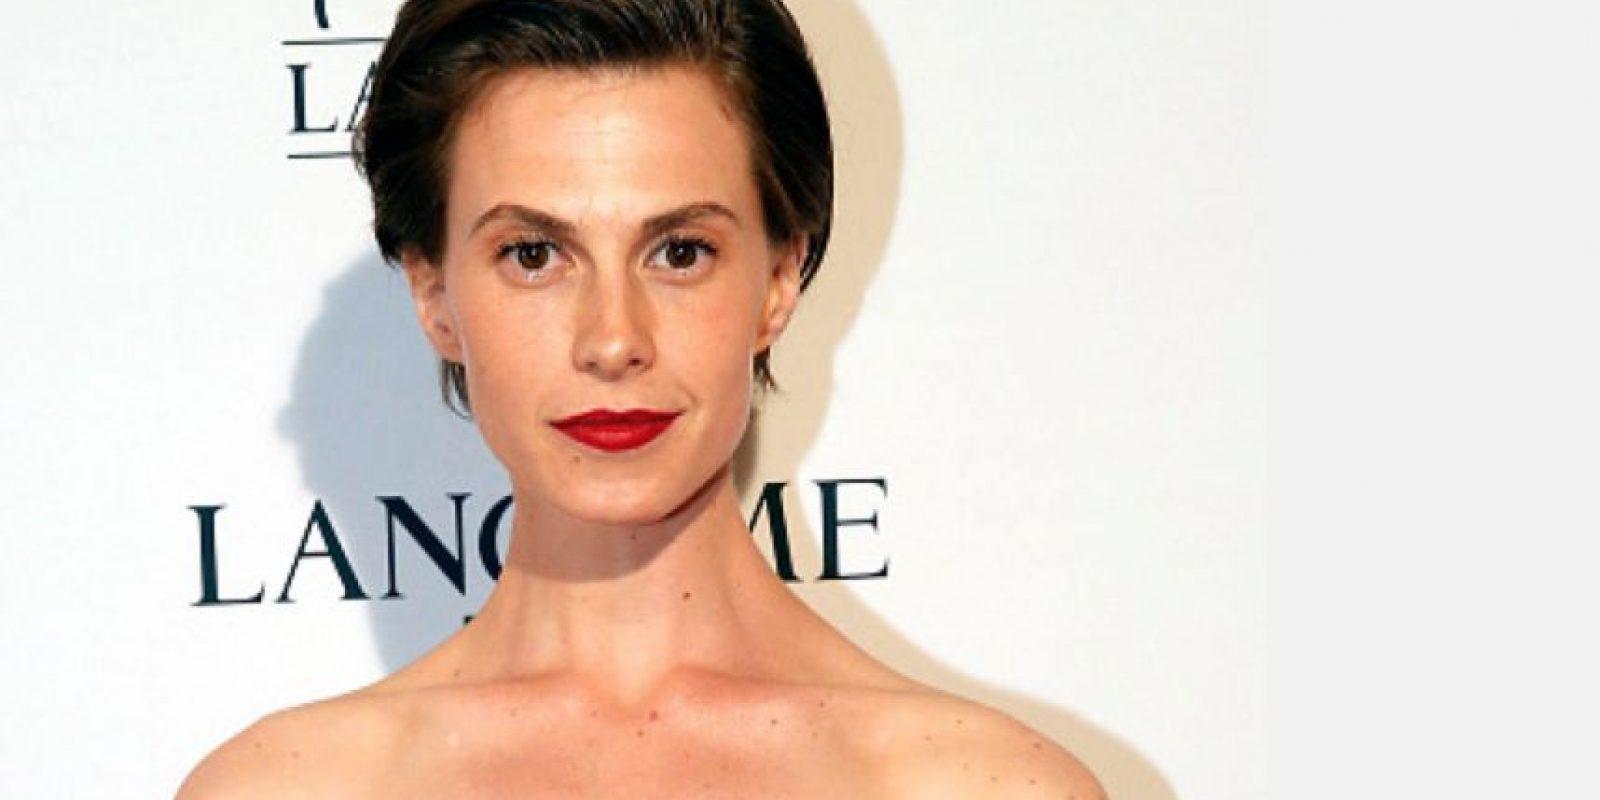 Elettra Wiedemann es hija de Isabella Rosellinni. Foto:vía Getty Images